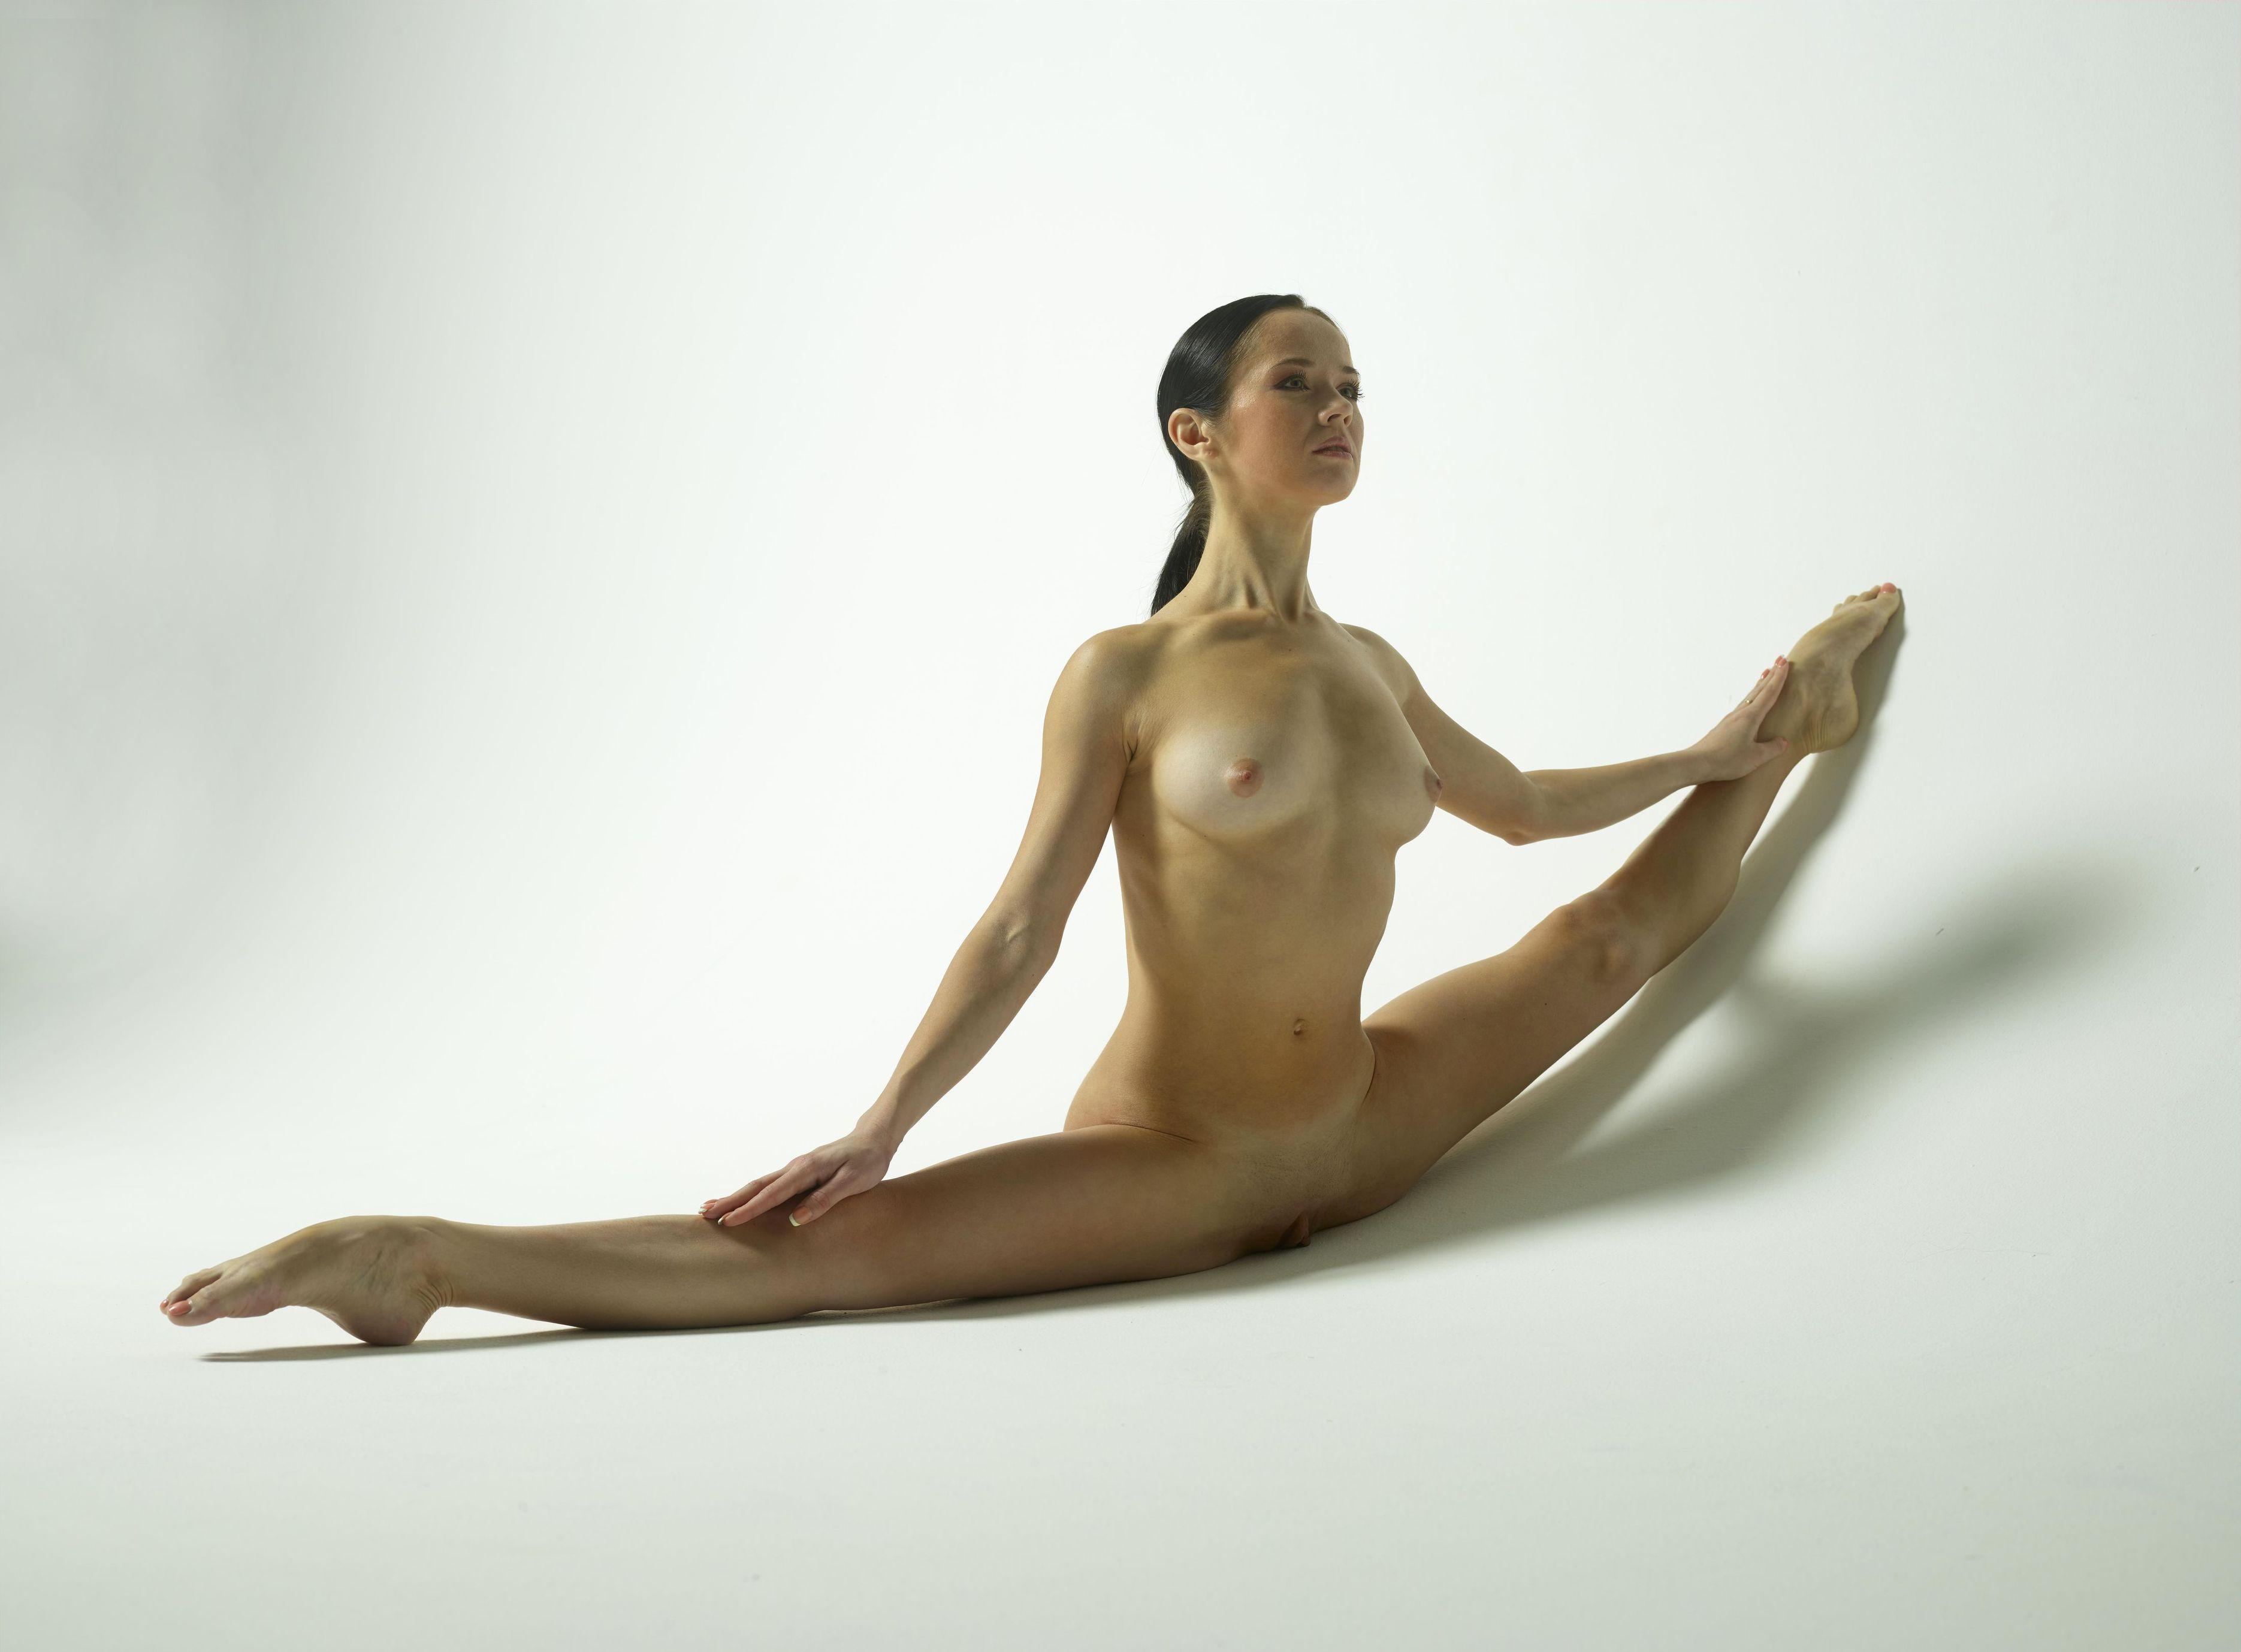 Нашпогате голая